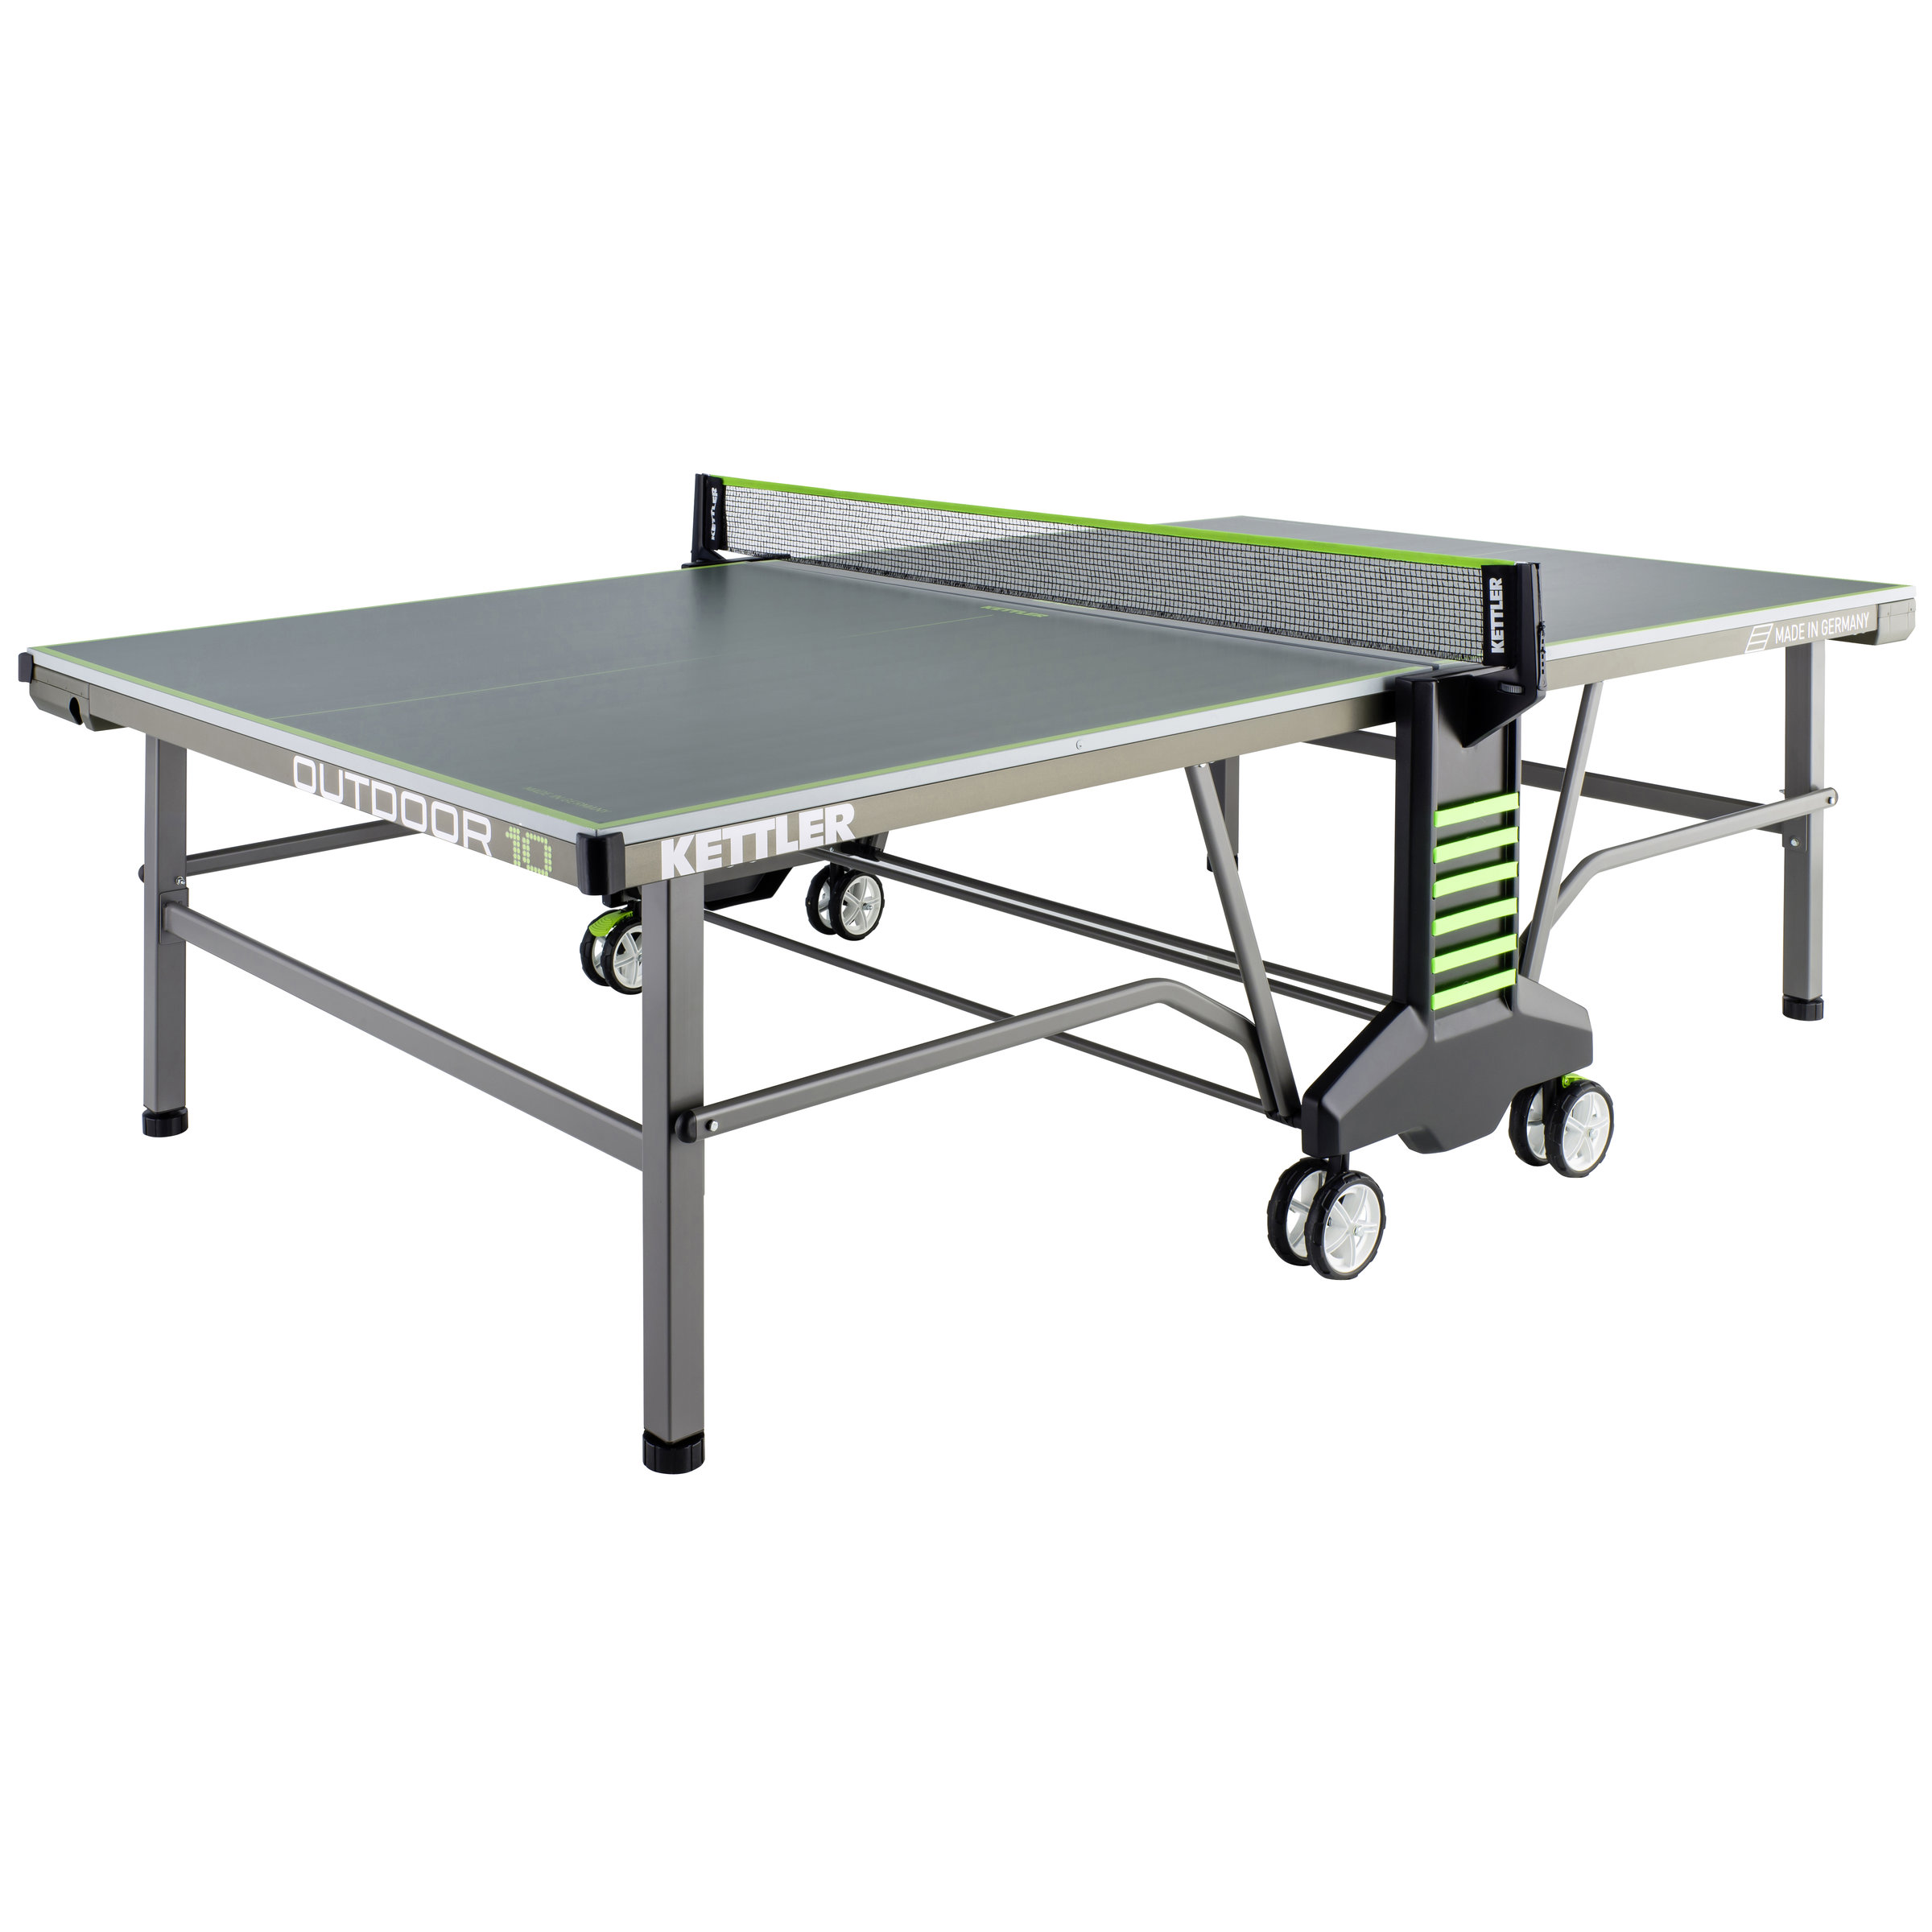 kettler tischtennisplatte outdoor 10 umbra gr n outdoor. Black Bedroom Furniture Sets. Home Design Ideas